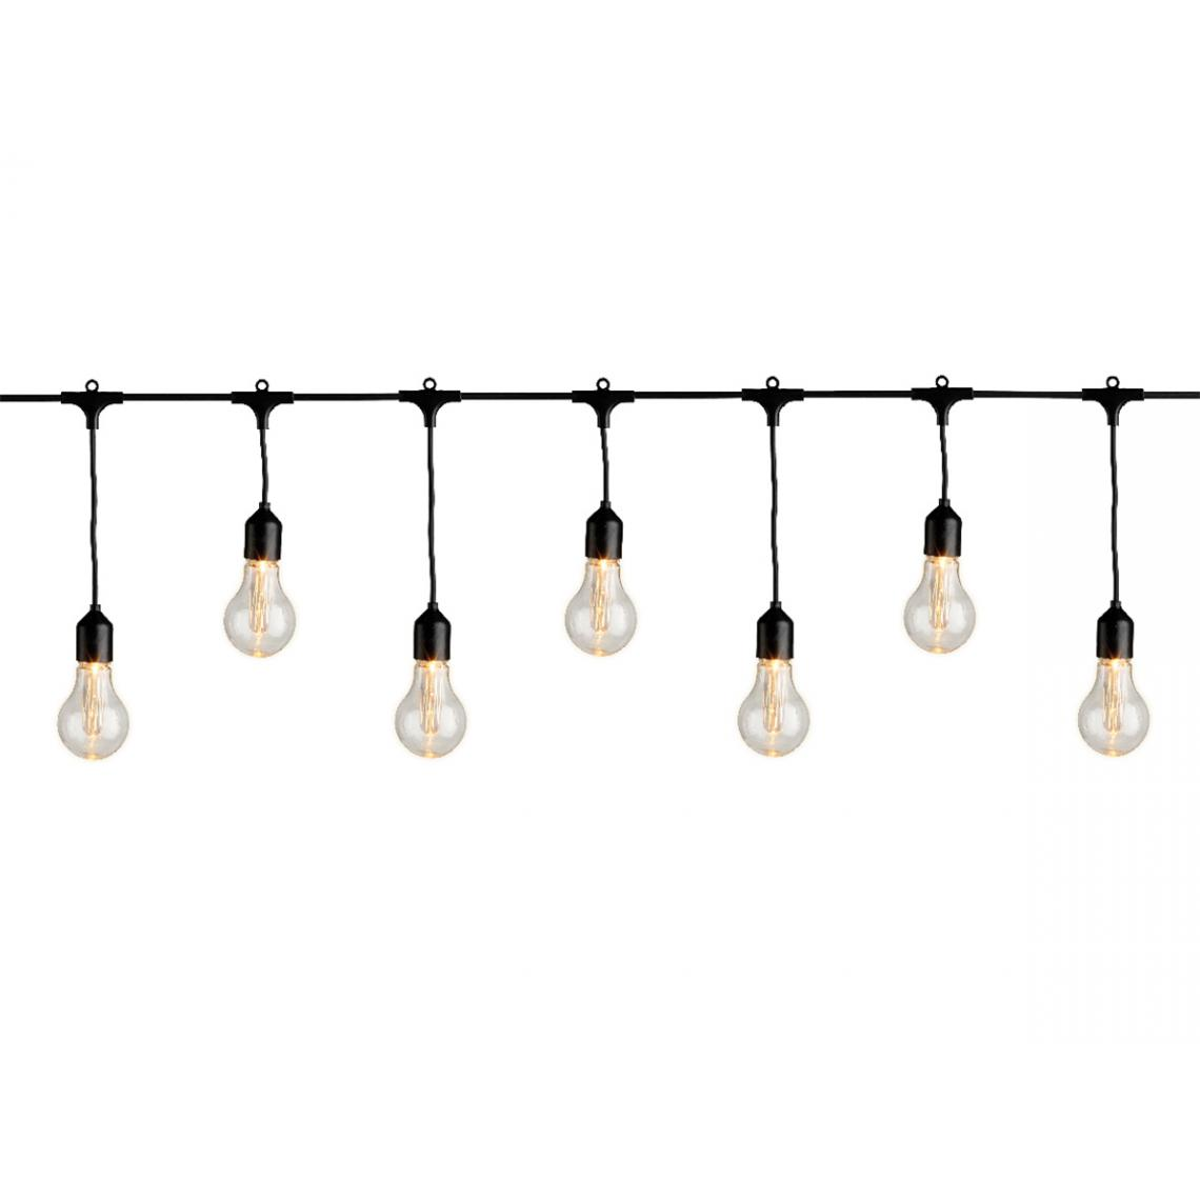 Jardideco Guirlande lumineuse grandes ampoules 20 LEDs - Jardideco